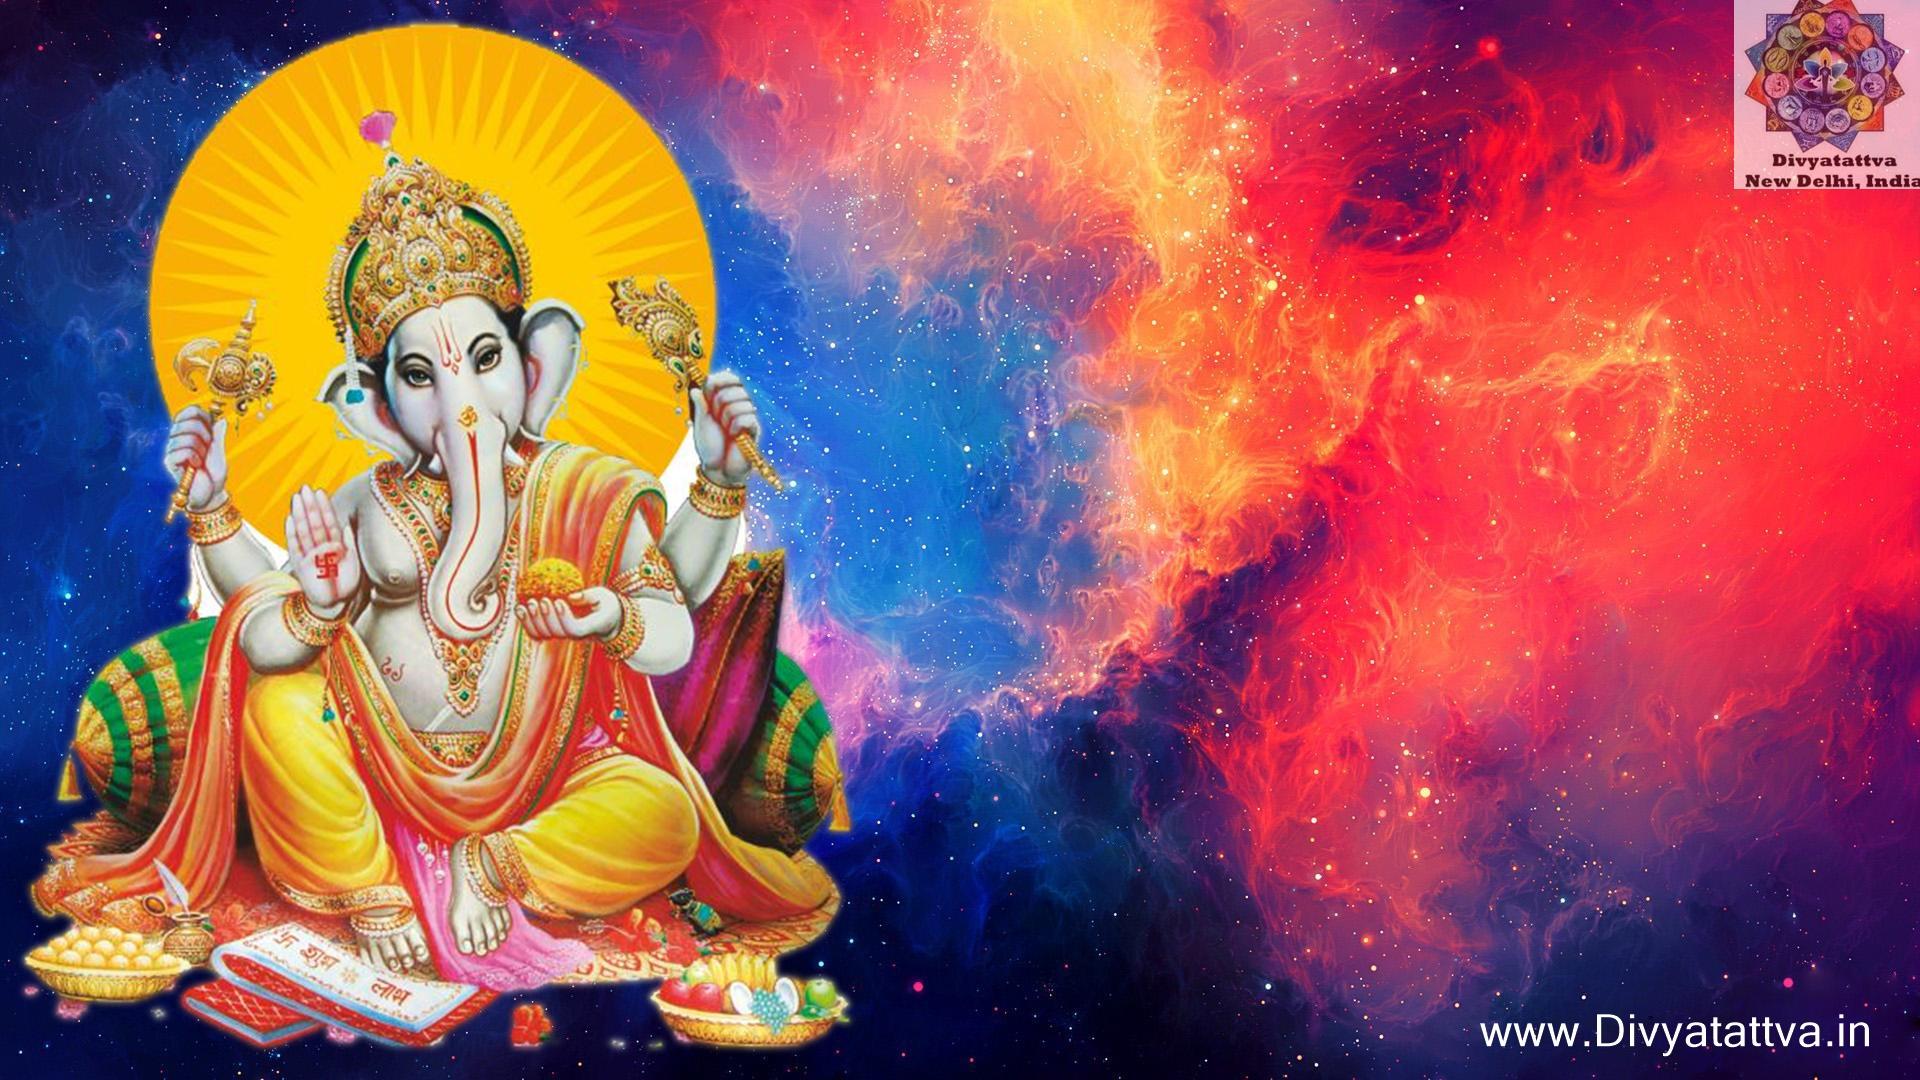 Ganesh images full hd, ganpati photo wallpaper, god ganesha images